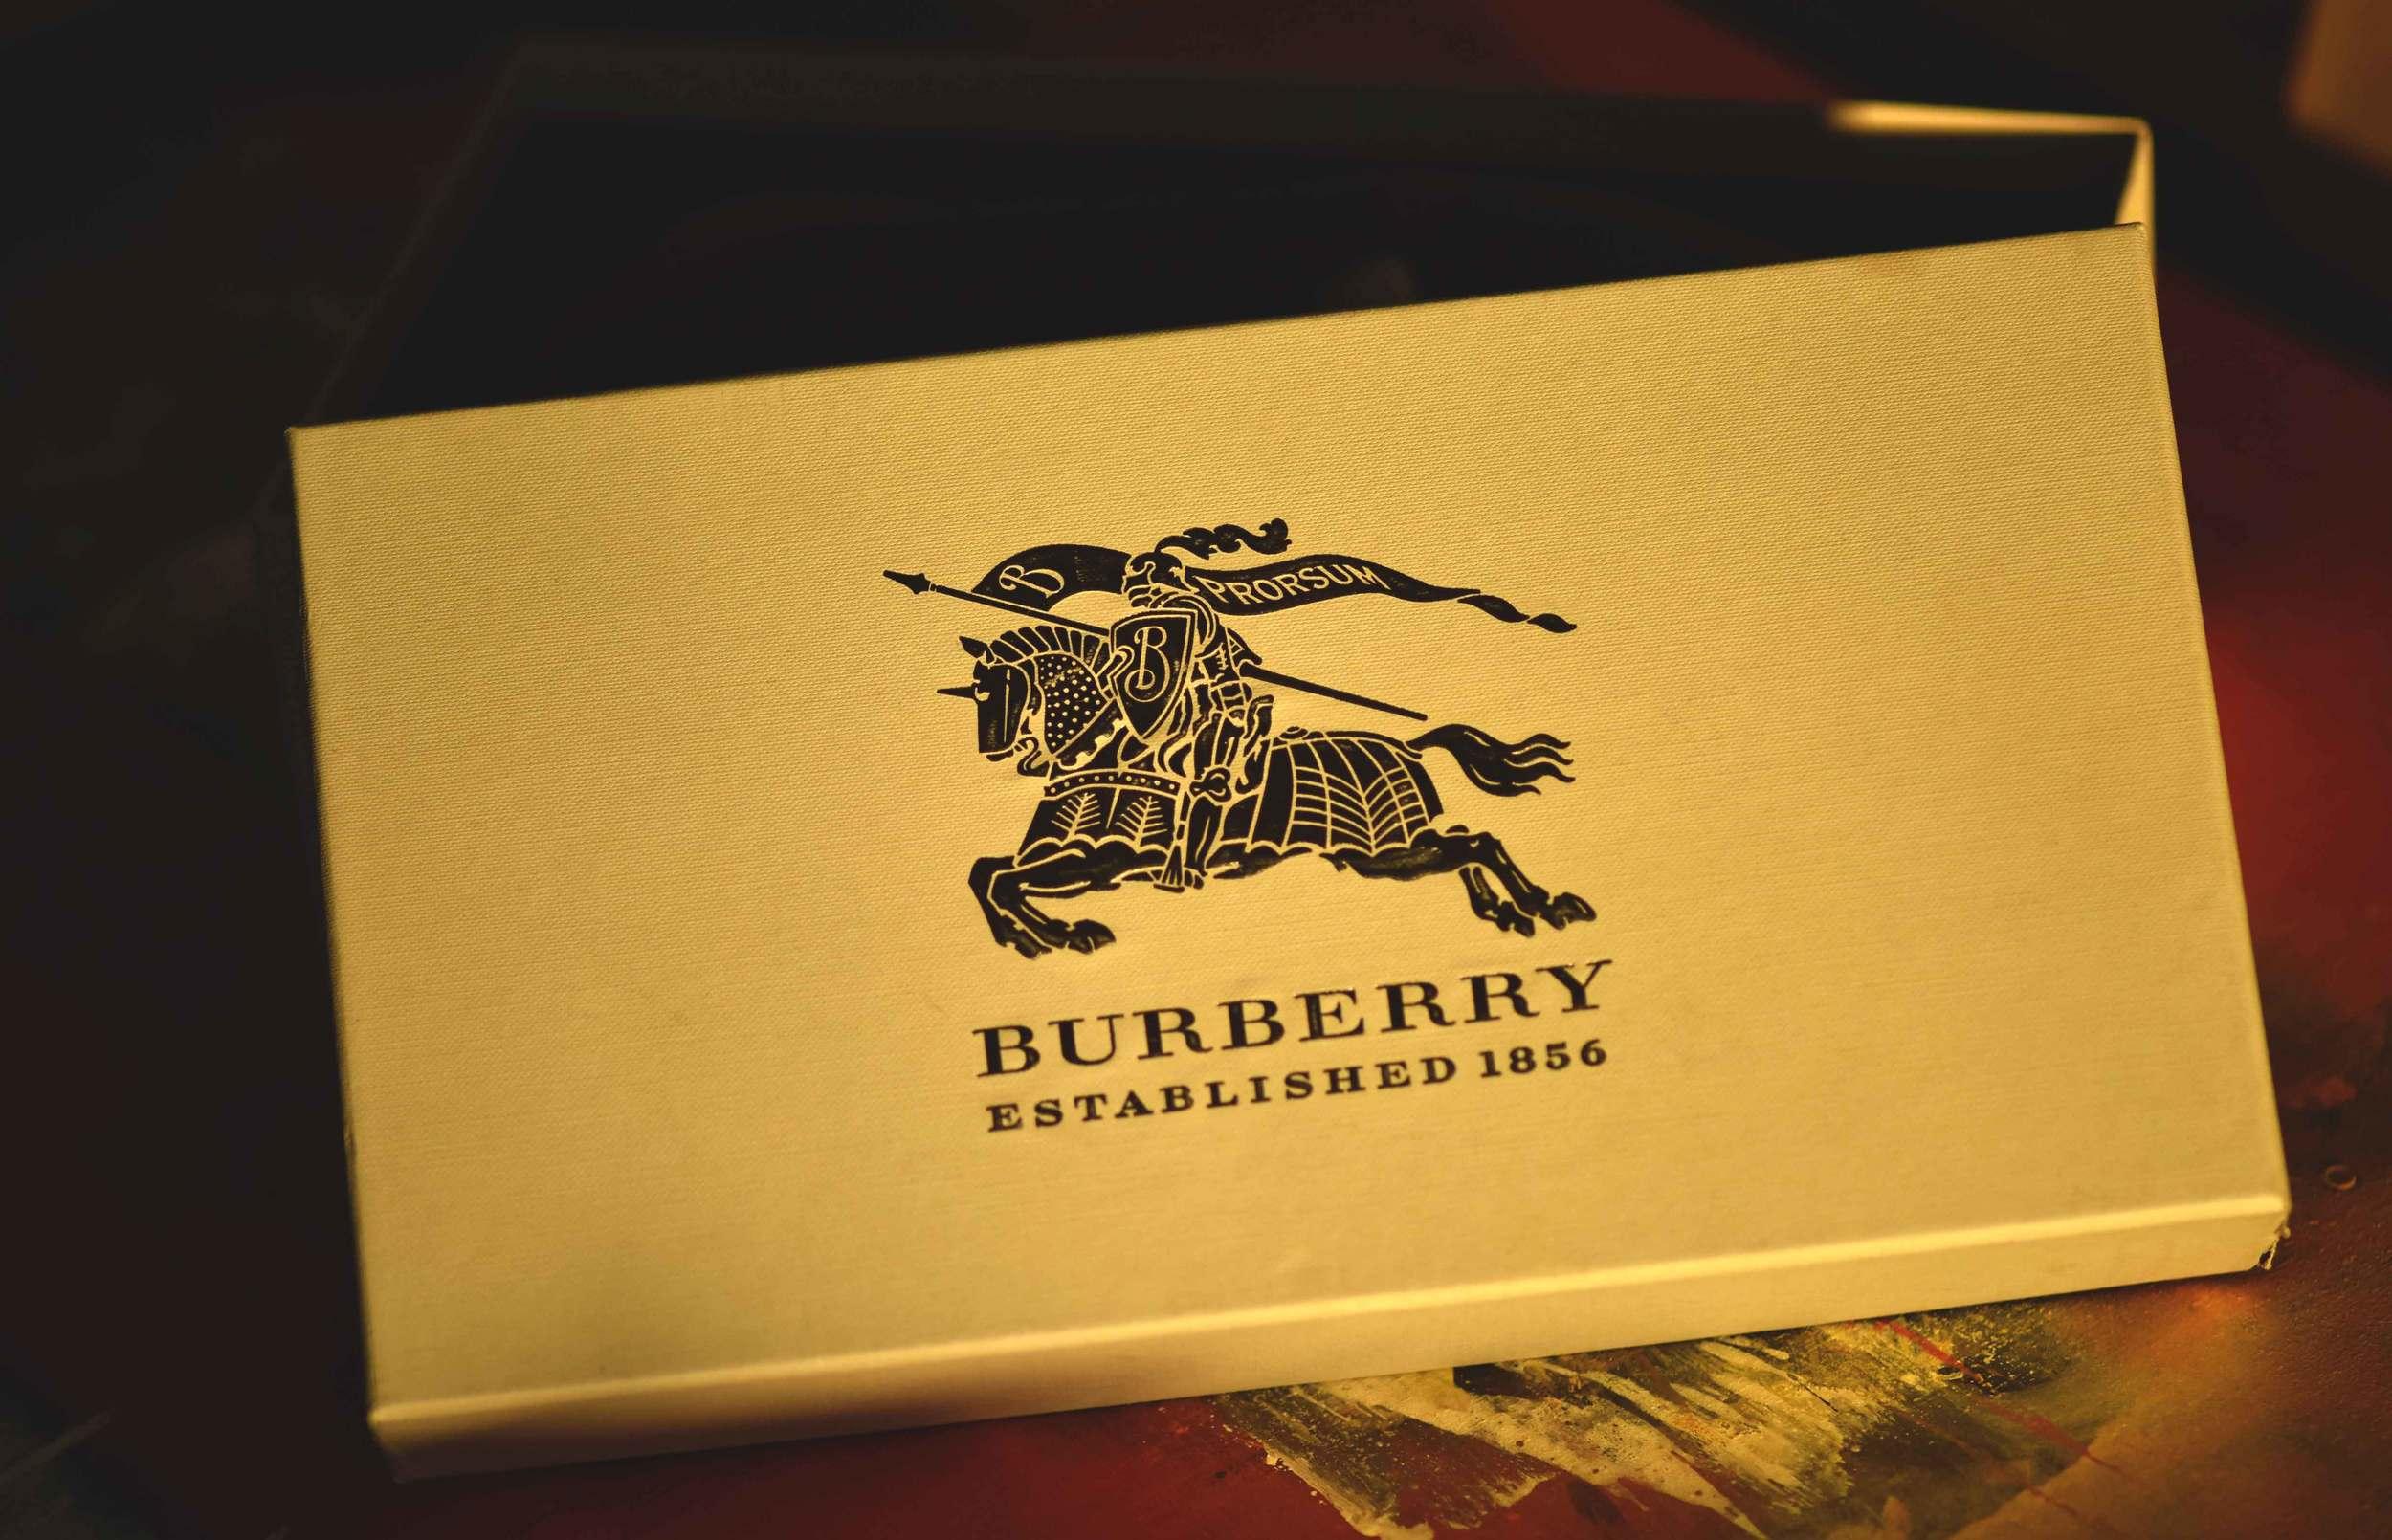 Burberry espadrilles shoe box, i love Burberry! Image©sourcingstyle.com